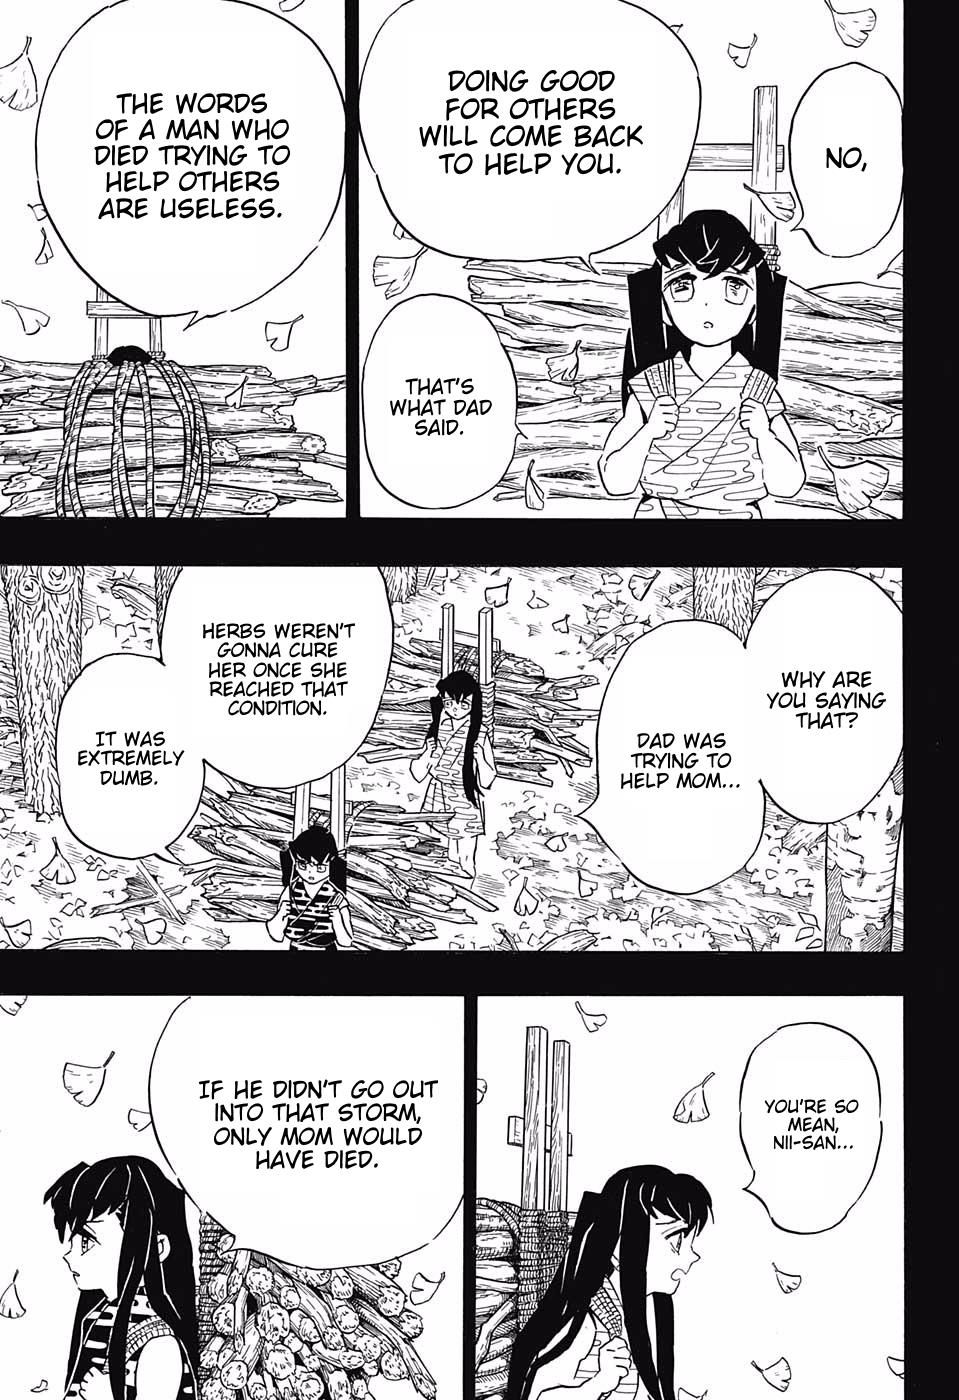 Demon Slayer Kimetsu No Yaiba Chapter 118 In 2020